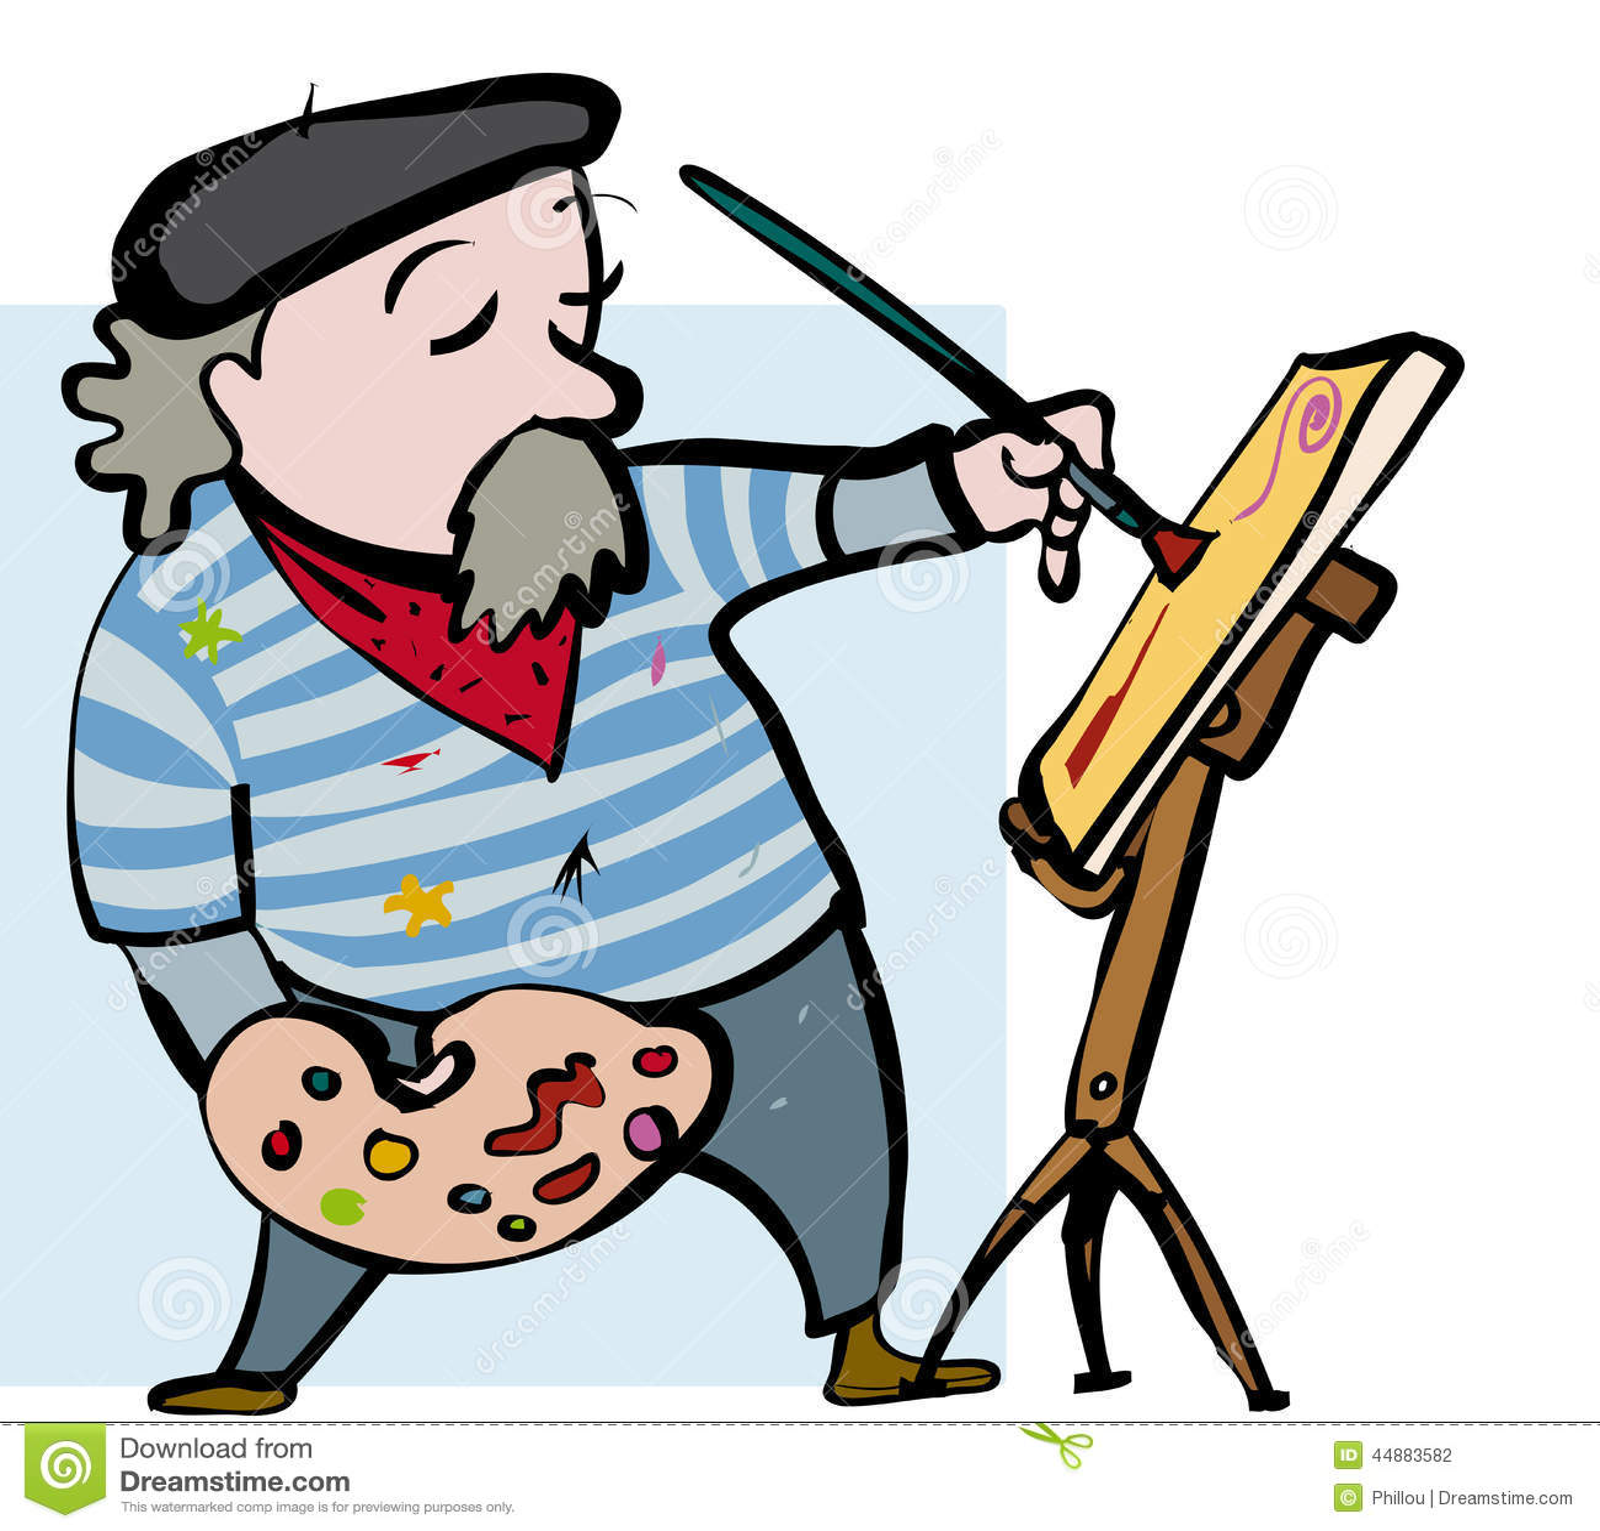 Artist Cartoon Stock Vector - Image: 44883582